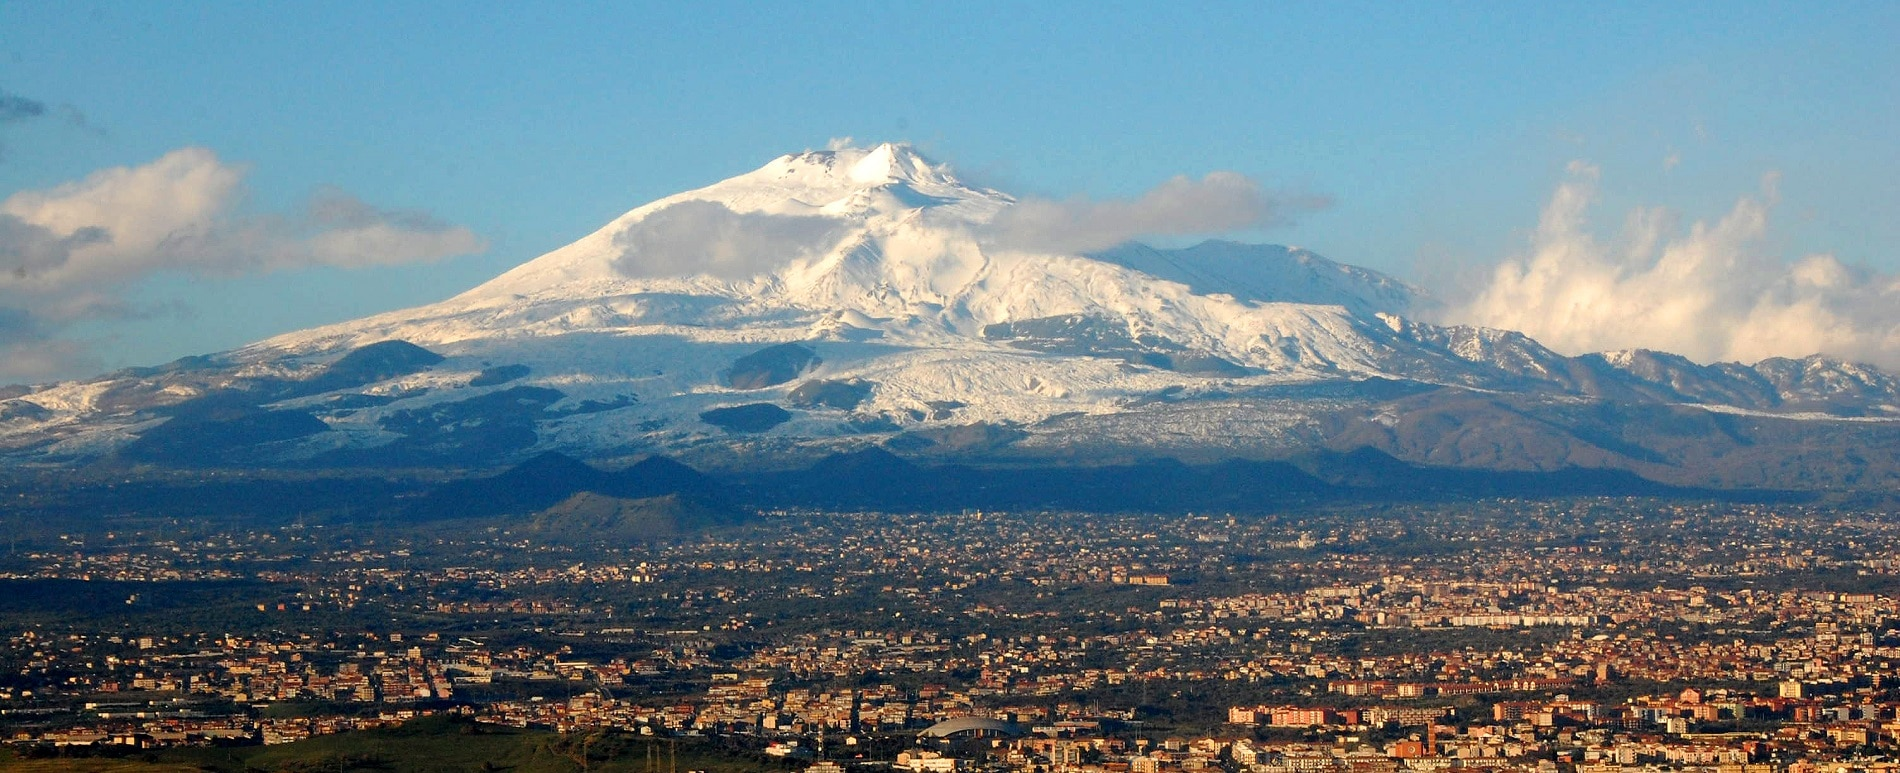 Vulcanul Etna, cel mai vechi vulcan din lume